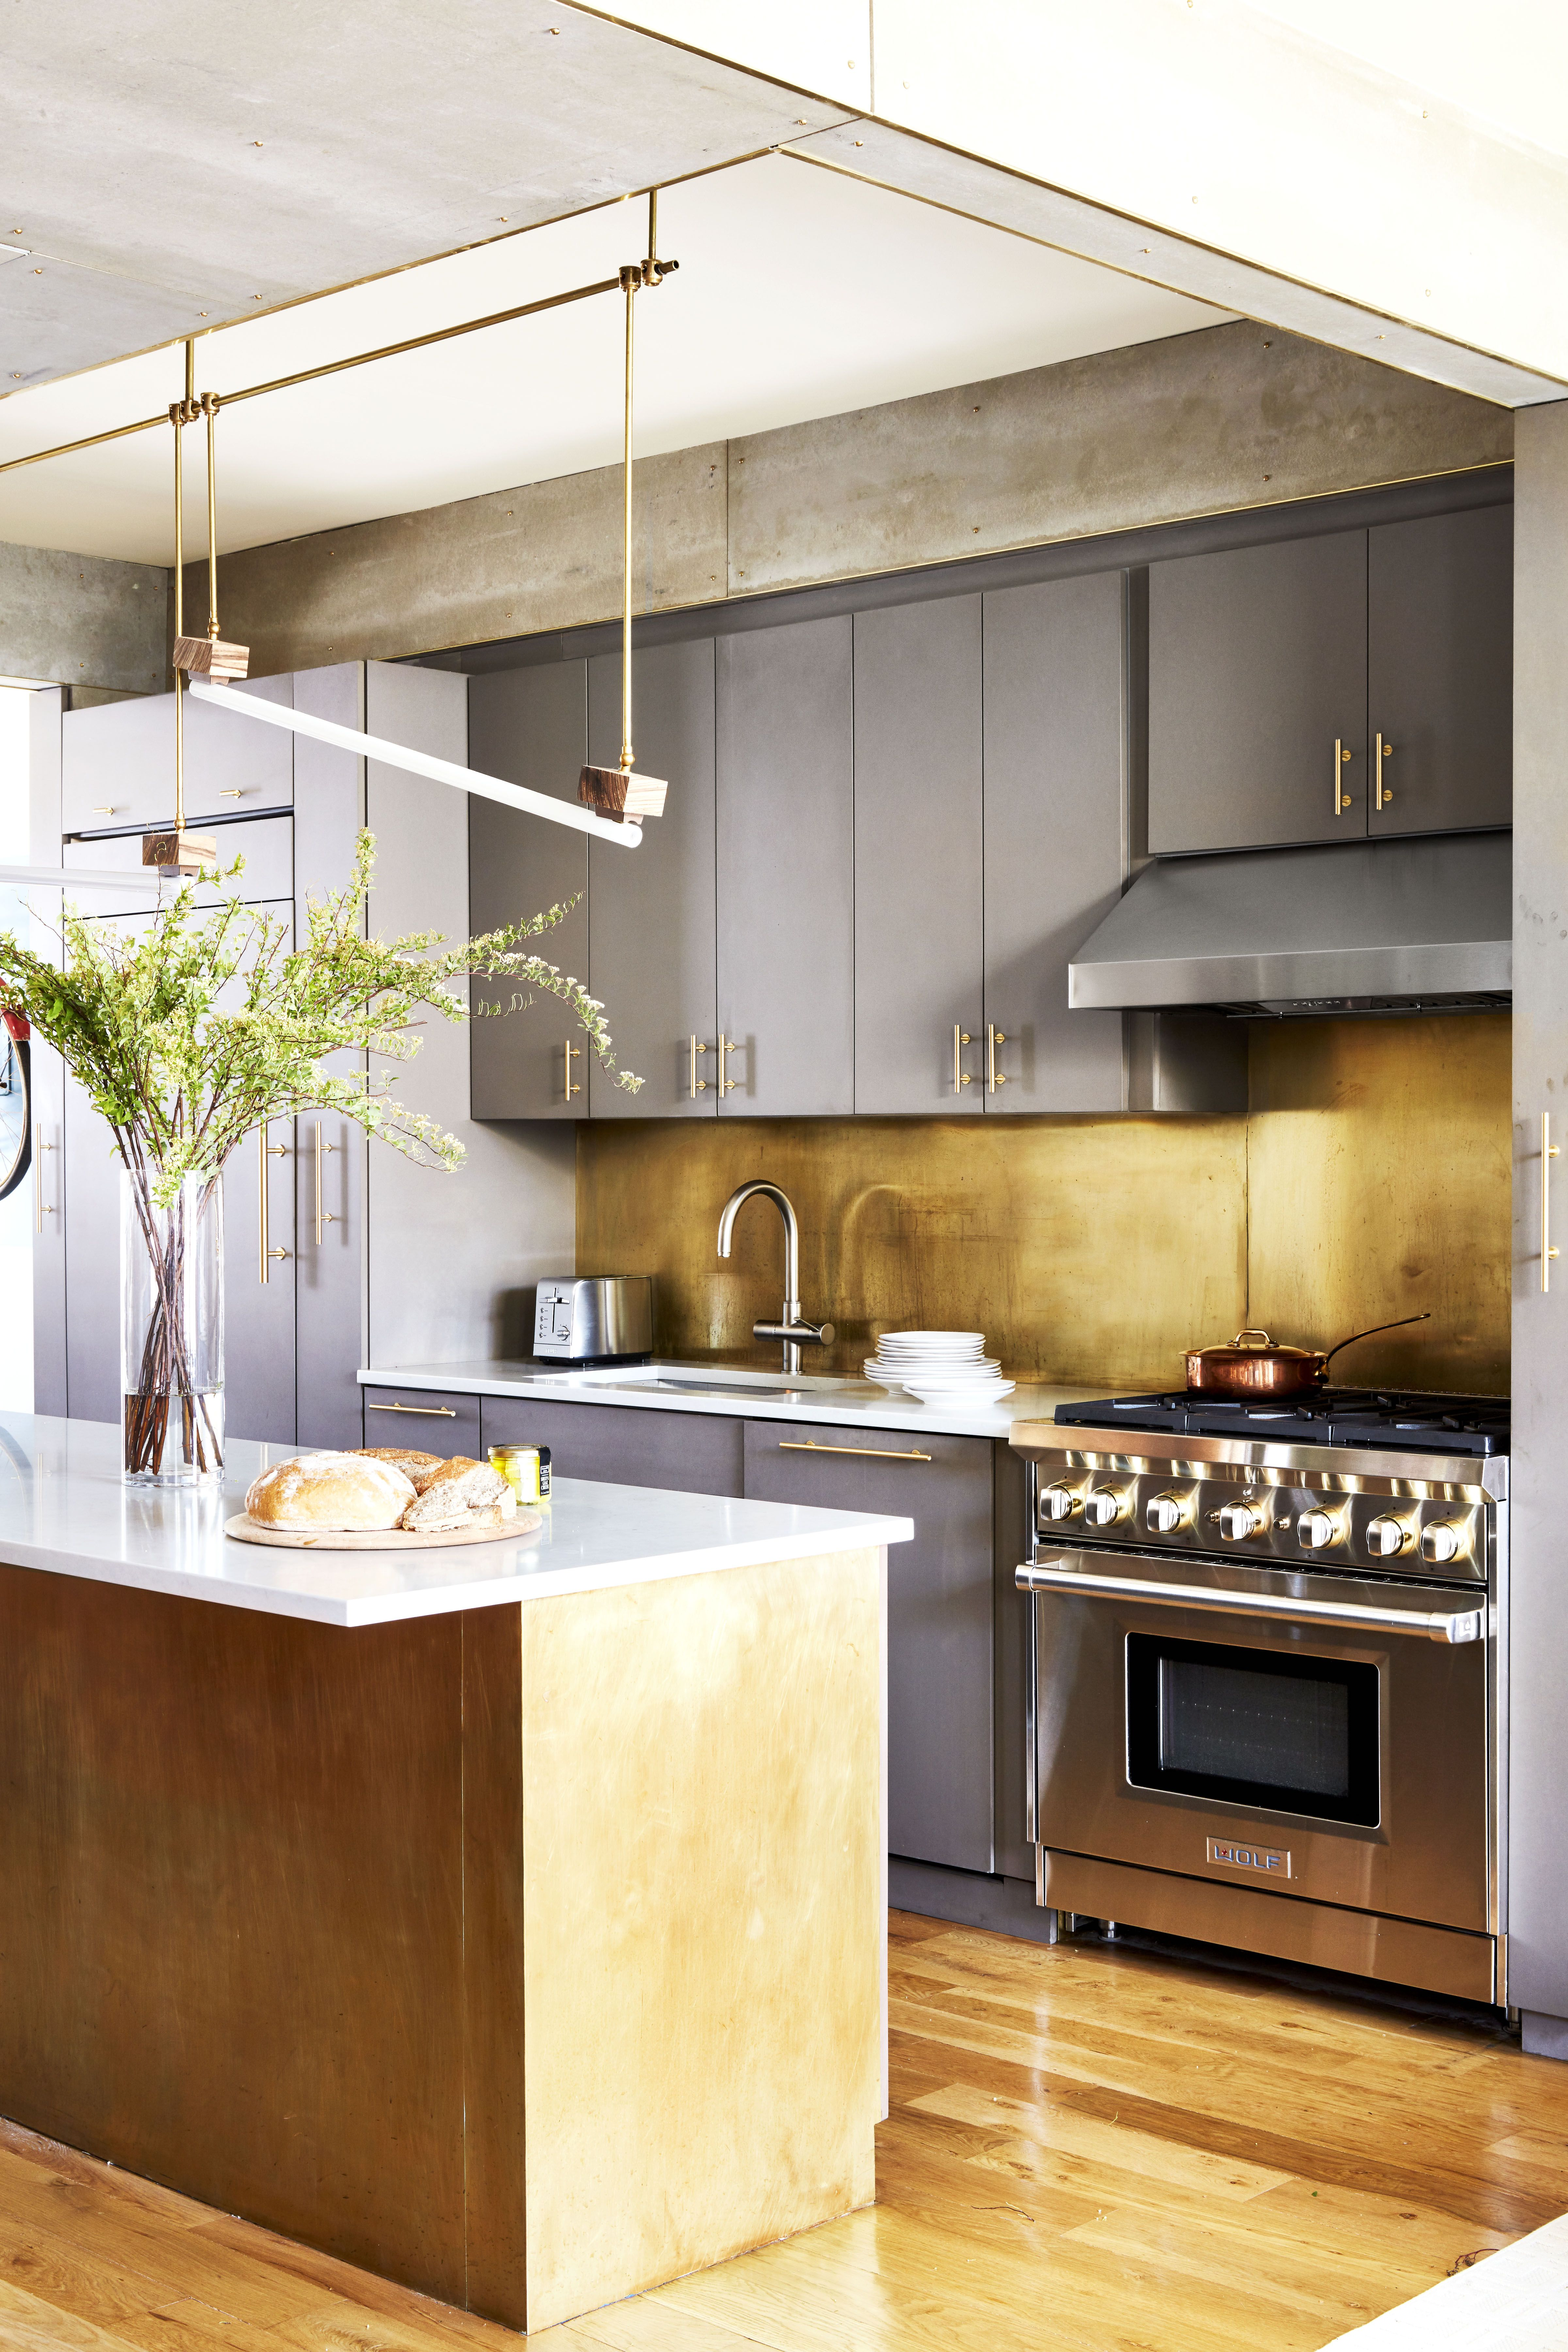 Kitchen Ideas Kitchen Cabinet Color Trends 9   Novocom.top